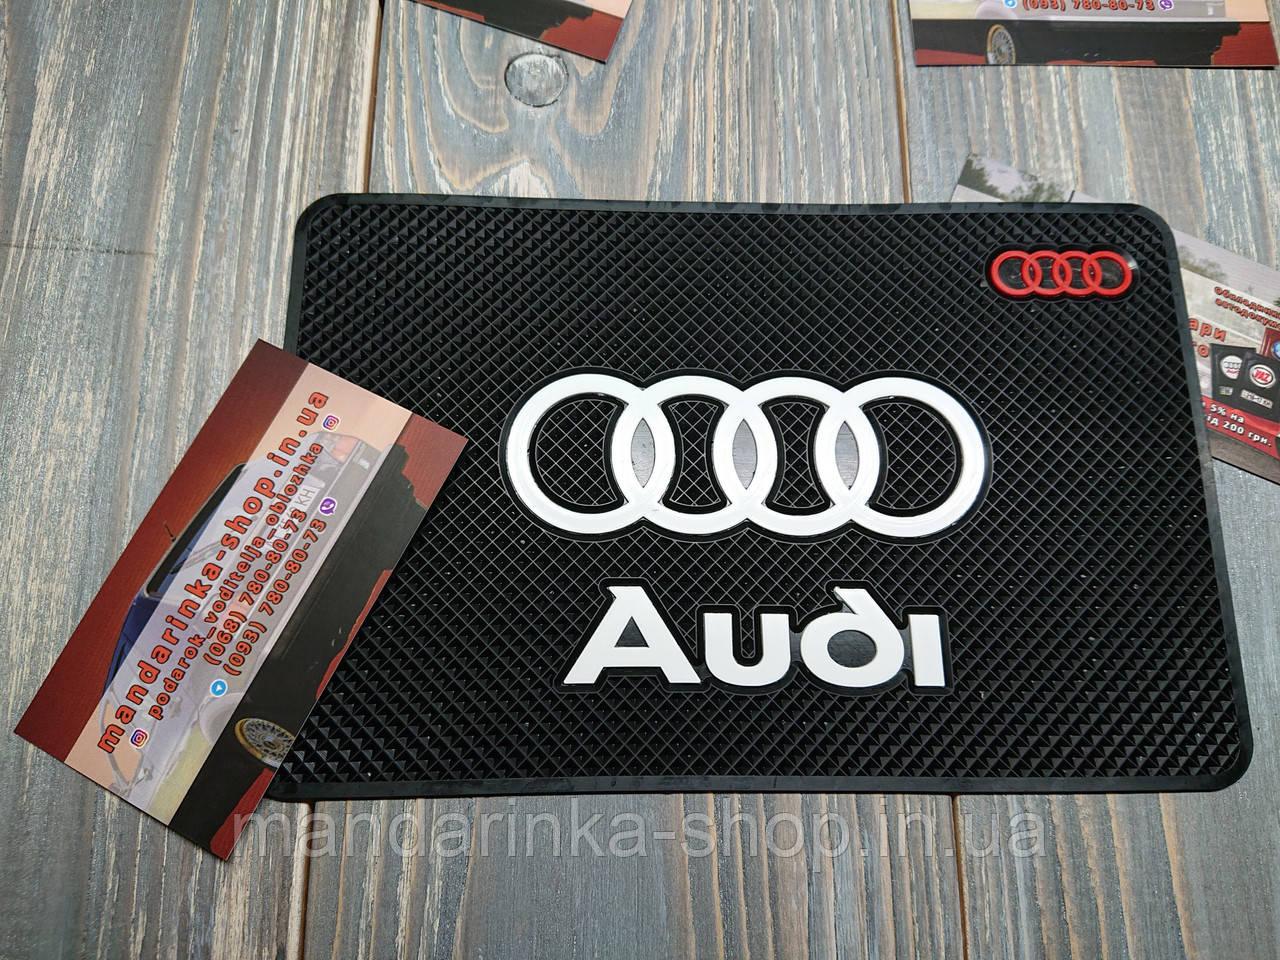 Антискользящий коврик на панель авто Audi (Ауди)